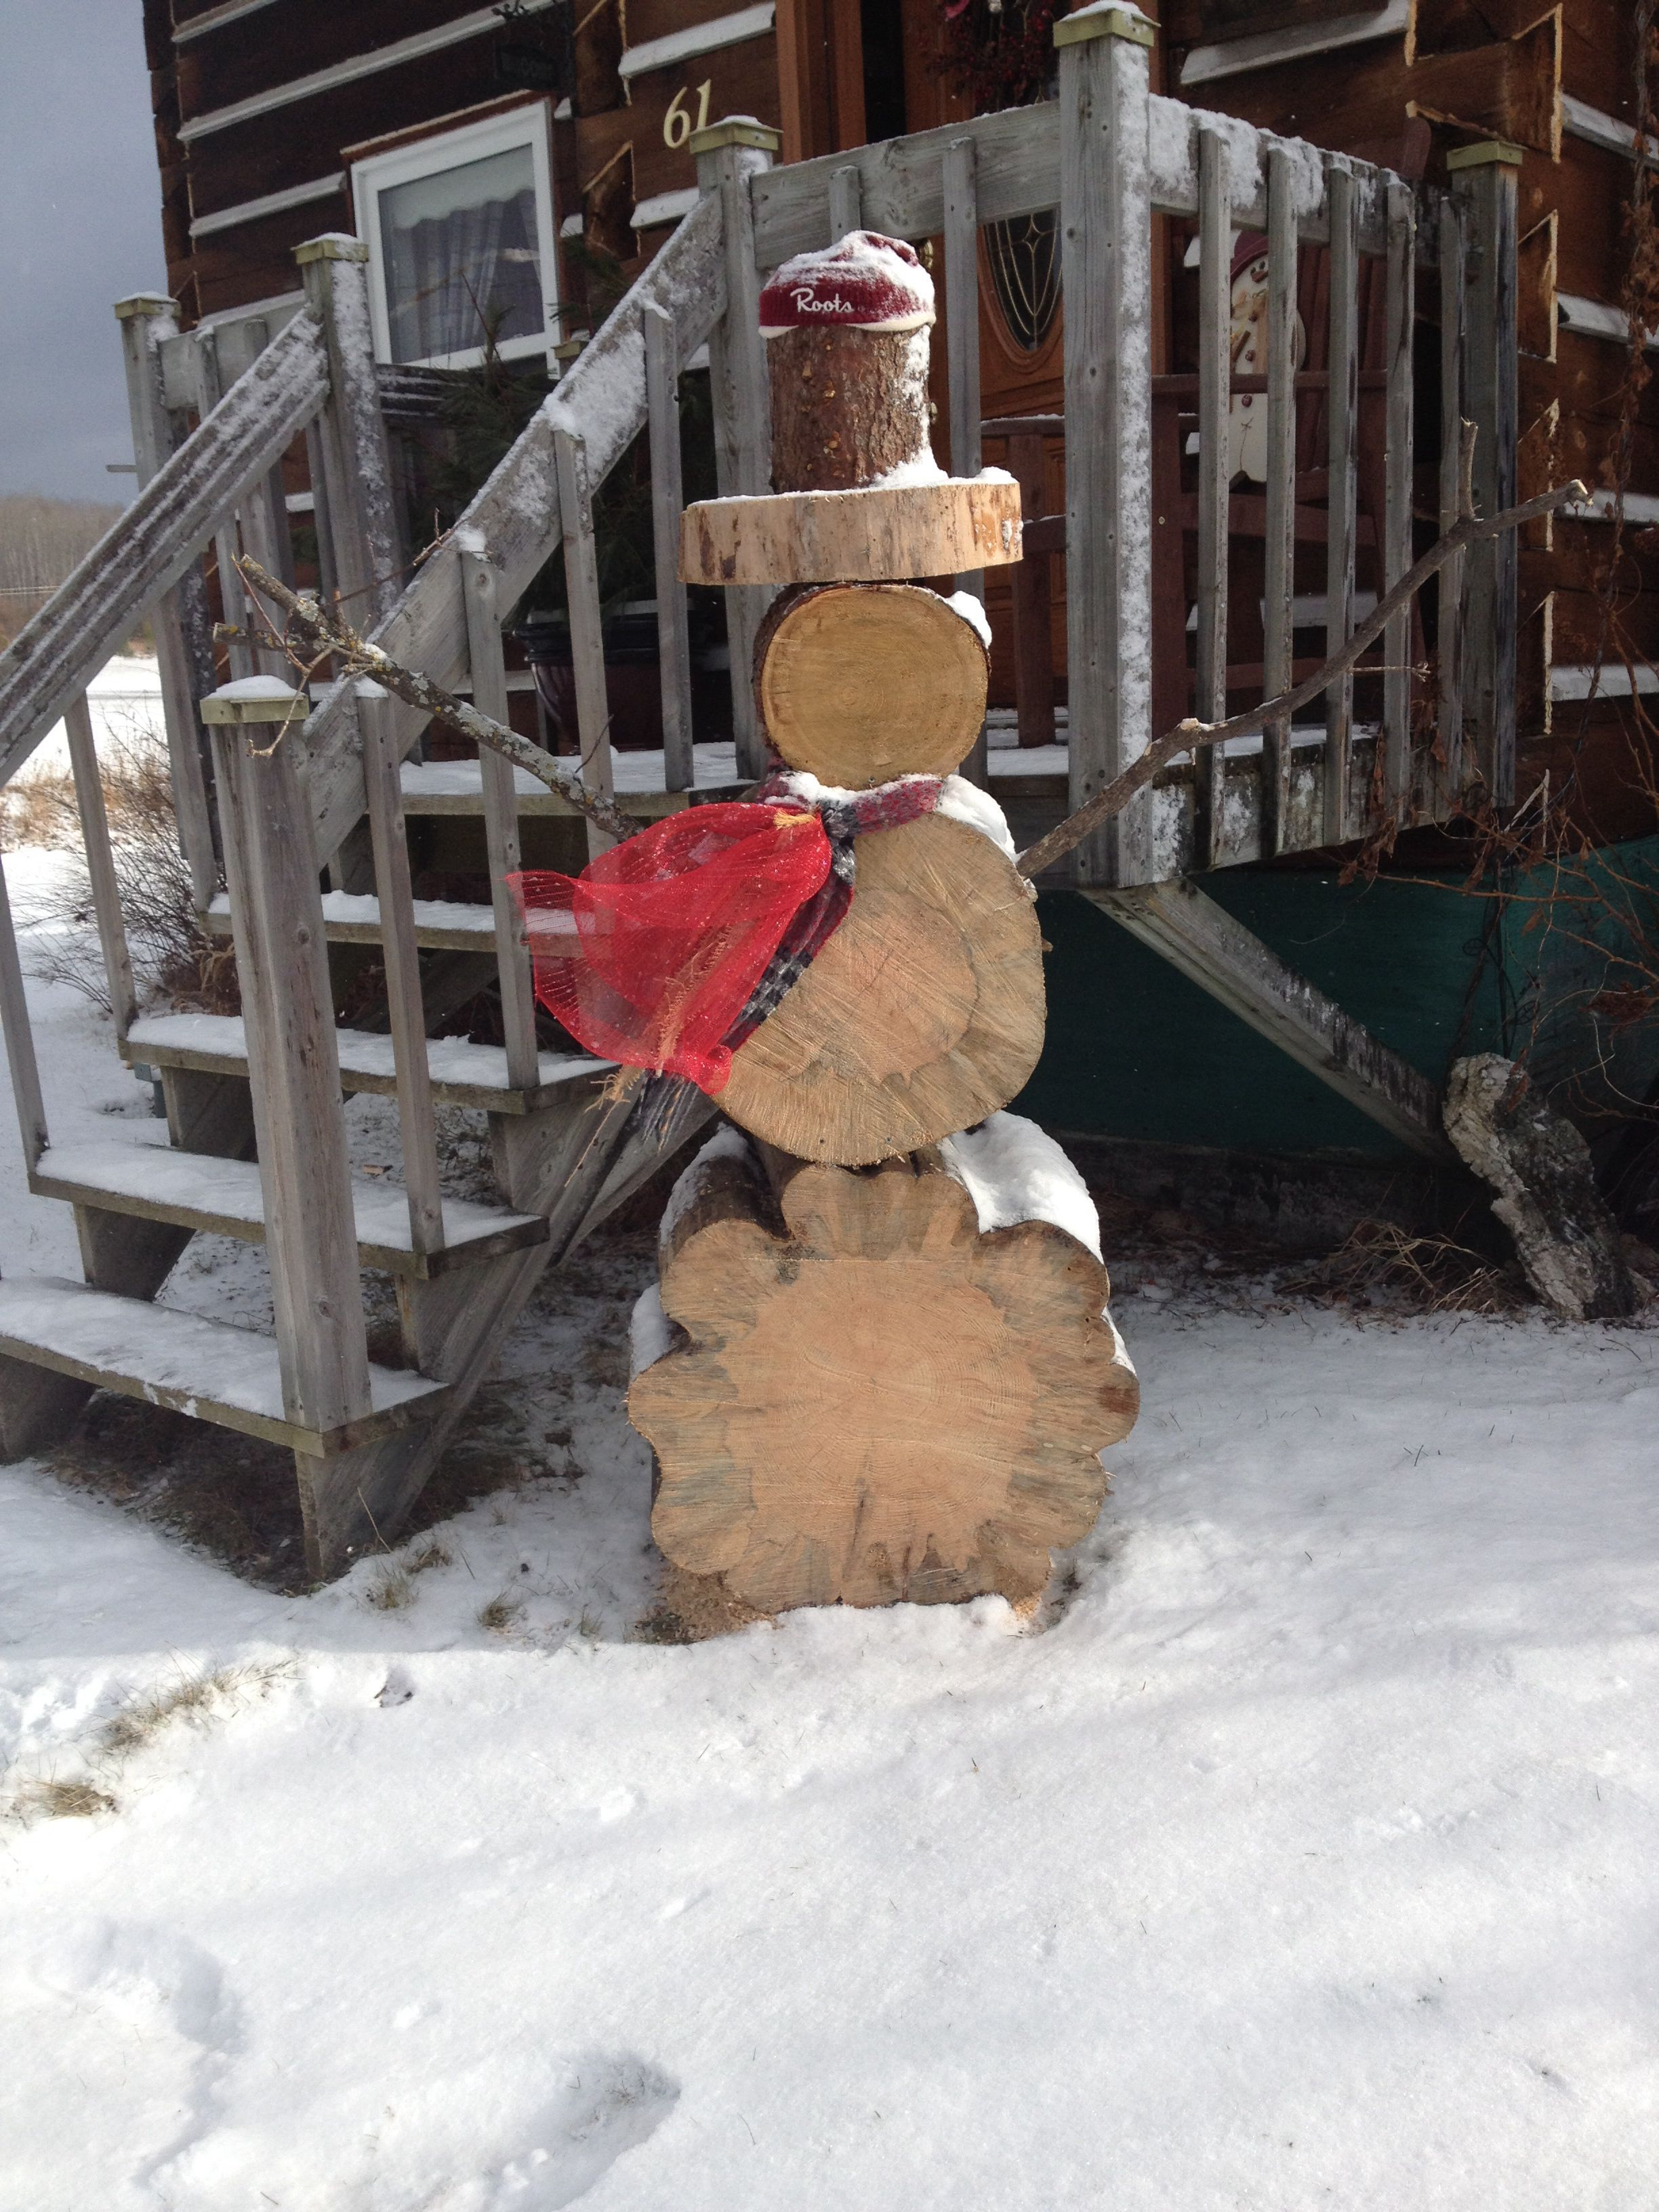 Tree trunk snowman Karla Pruitt Pruitt Olney Christmas